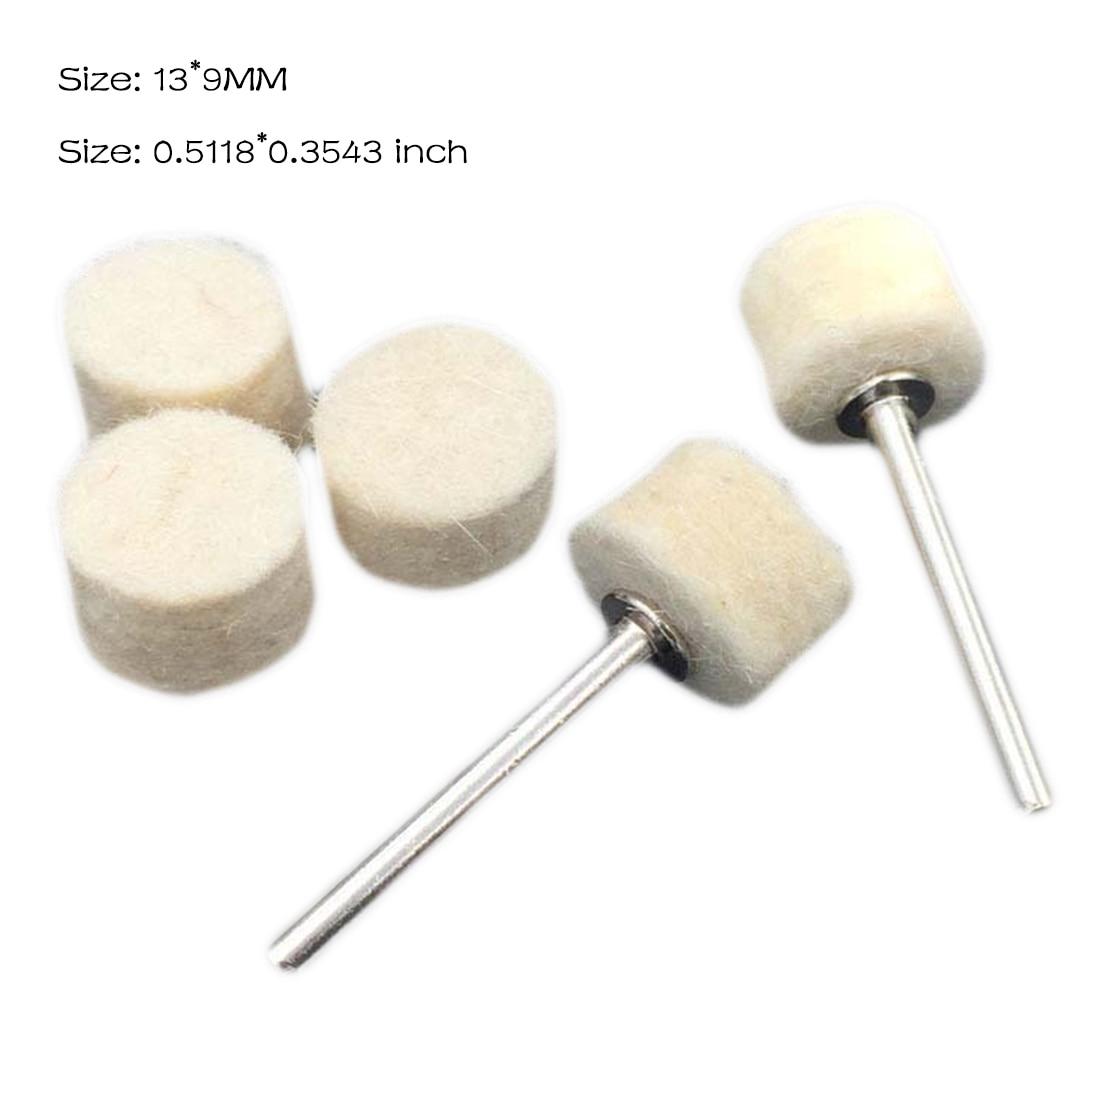 Grinding Polishing Pad 100Pcs 13mm Wool Felt Polishing Buffing Wheel +2Pcs 3.2mm Shanks For Dremel Rotary Tool Dremel Accessorie